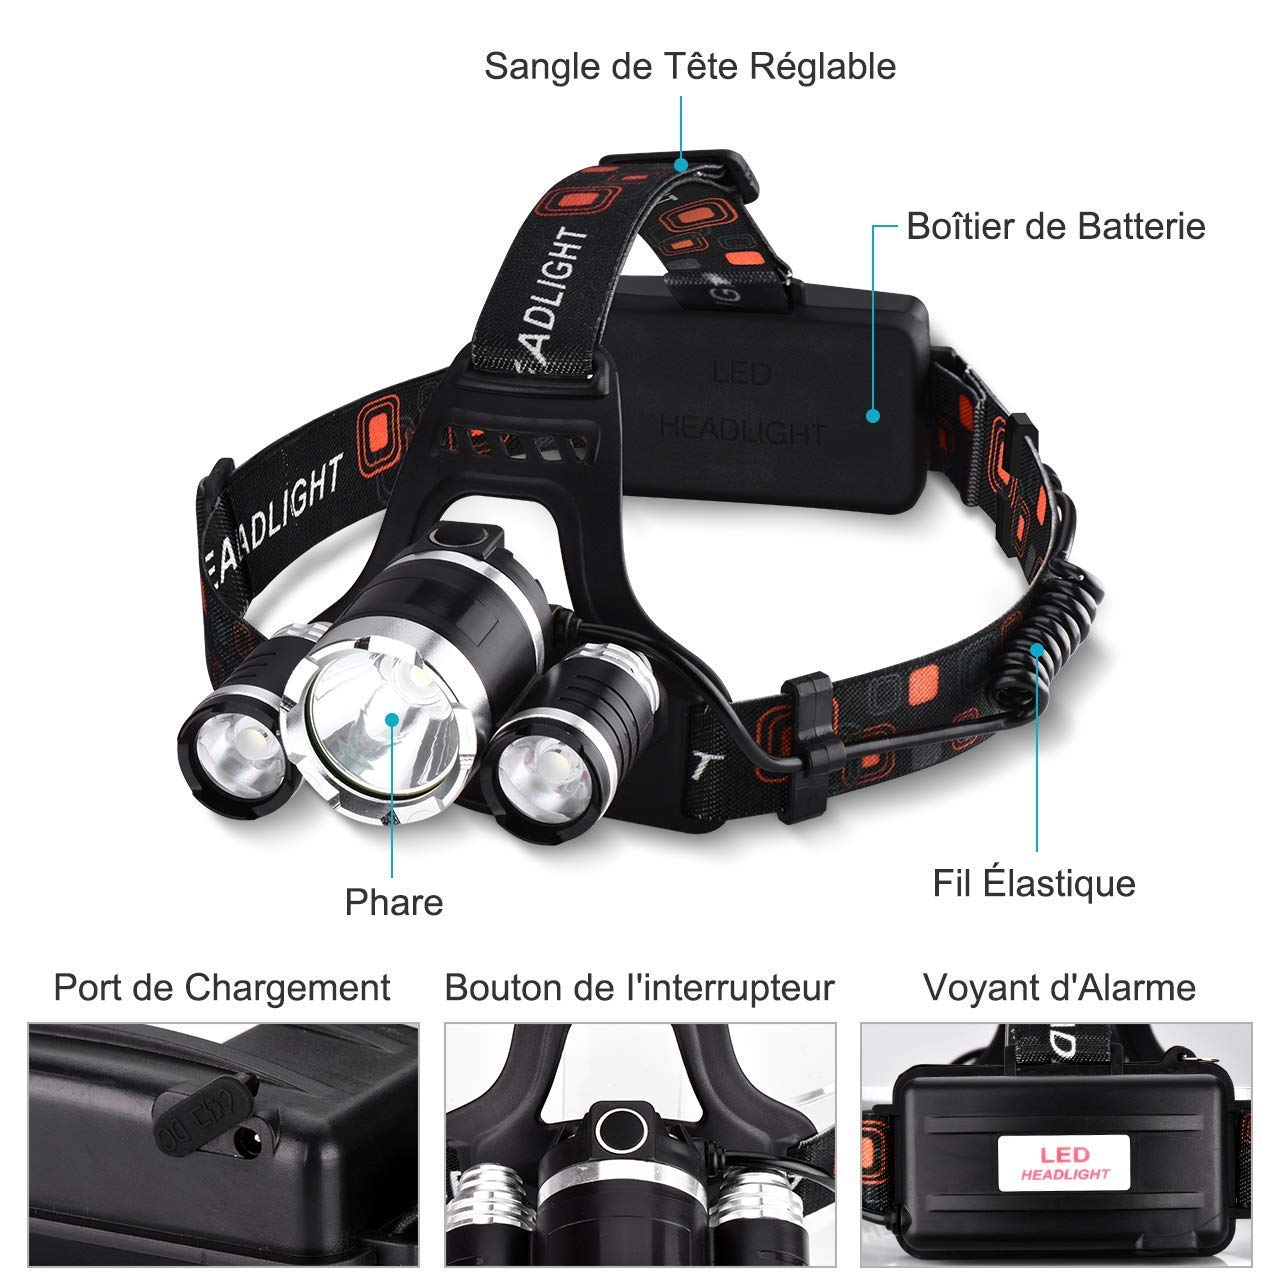 Luz de Emergencias Pesca Linterna Frontal con Bater/ías 5000Lum 4 Modo de Luz hasta 400Mt y hasta 6h Usar de TopElek con Ligero Peso 3 LED Alta Potencia para Camping Exterior e Interior